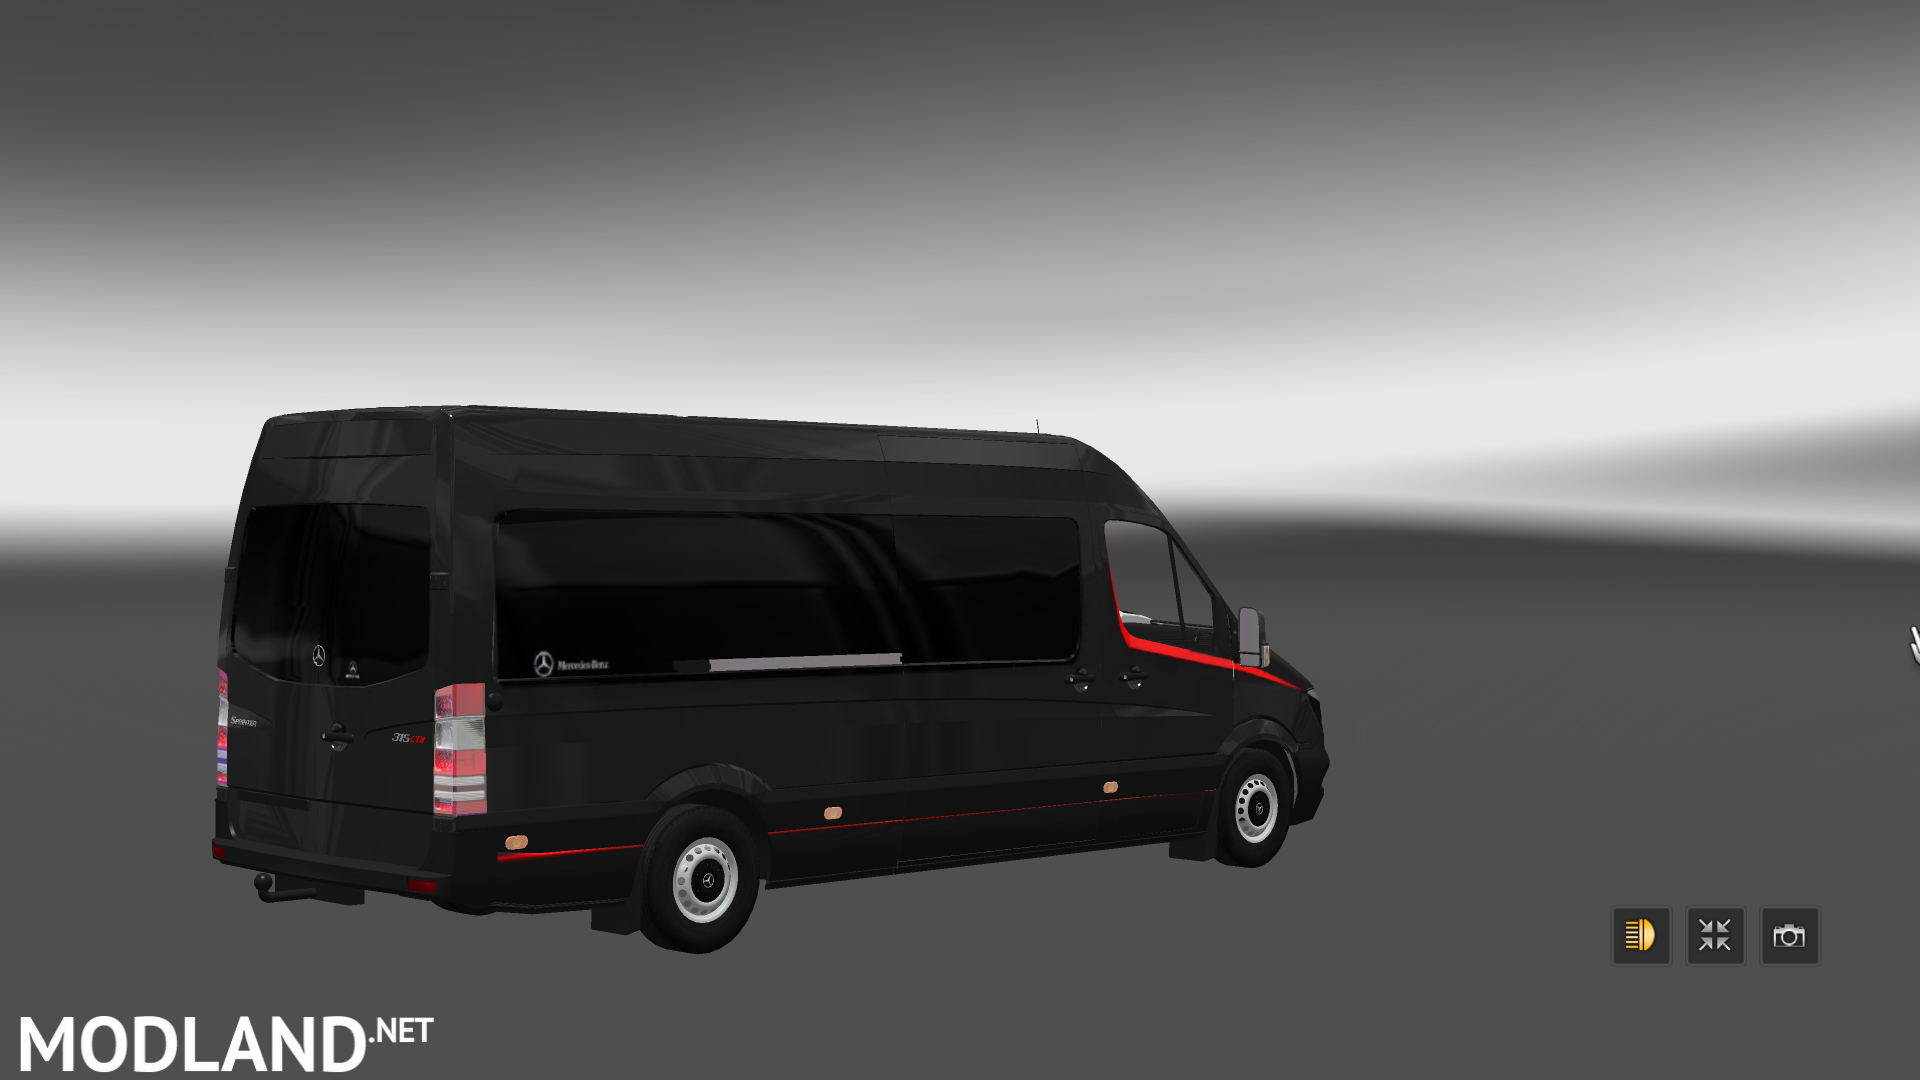 Mercedes Sprinter Long 2014 Minibus Skin Pack V 1 1 Mod